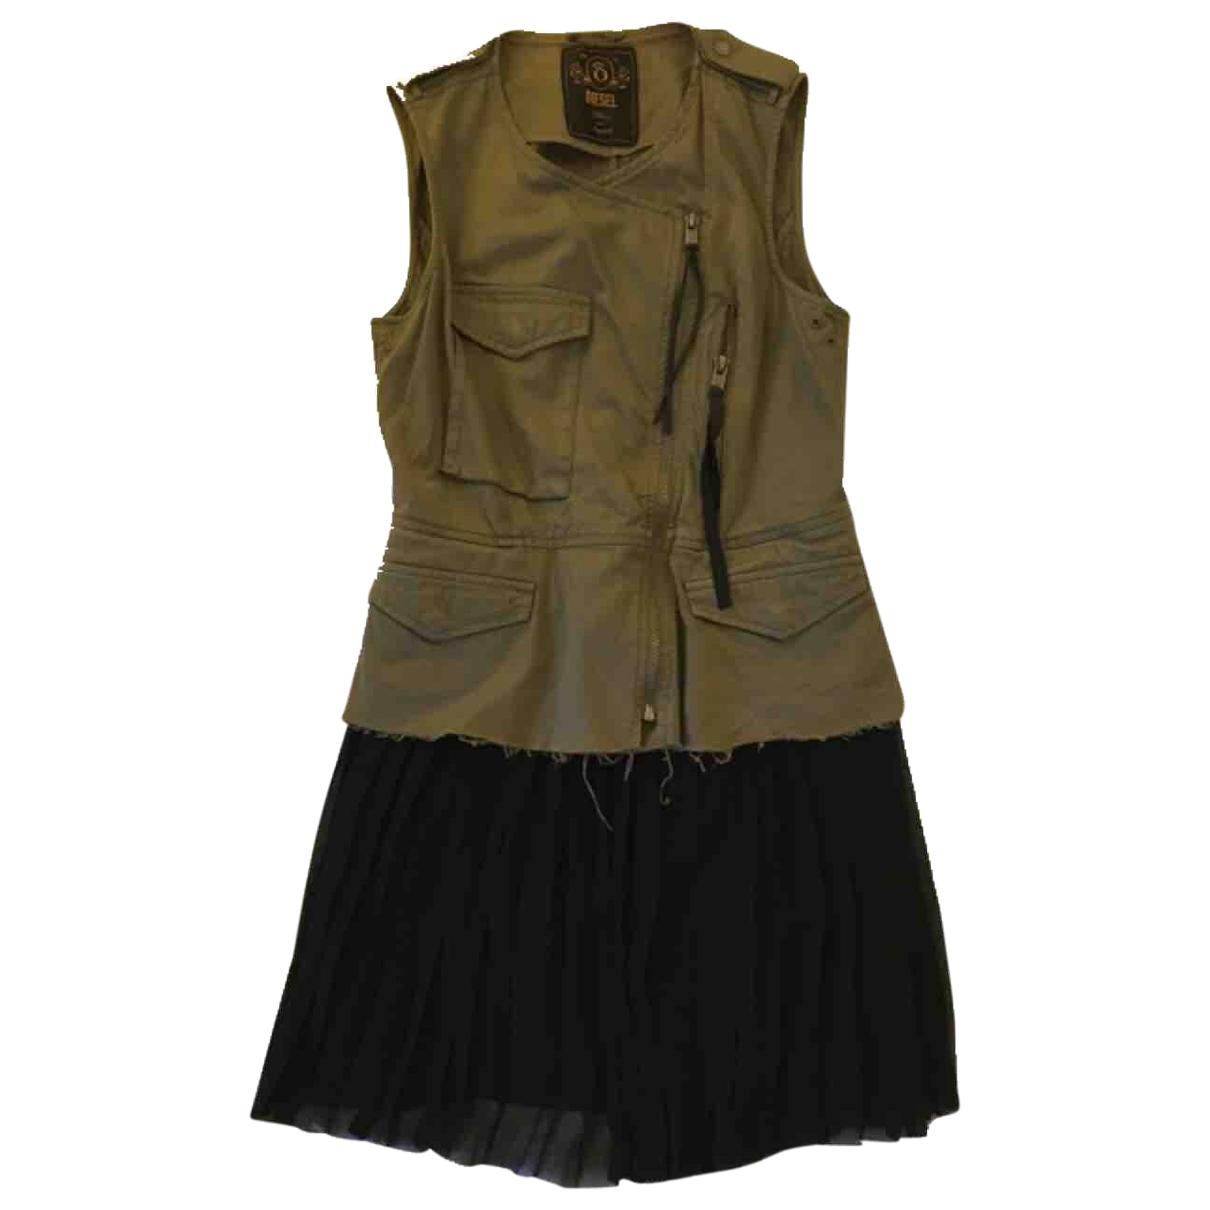 Diesel \N Khaki Cotton dress for Women S International